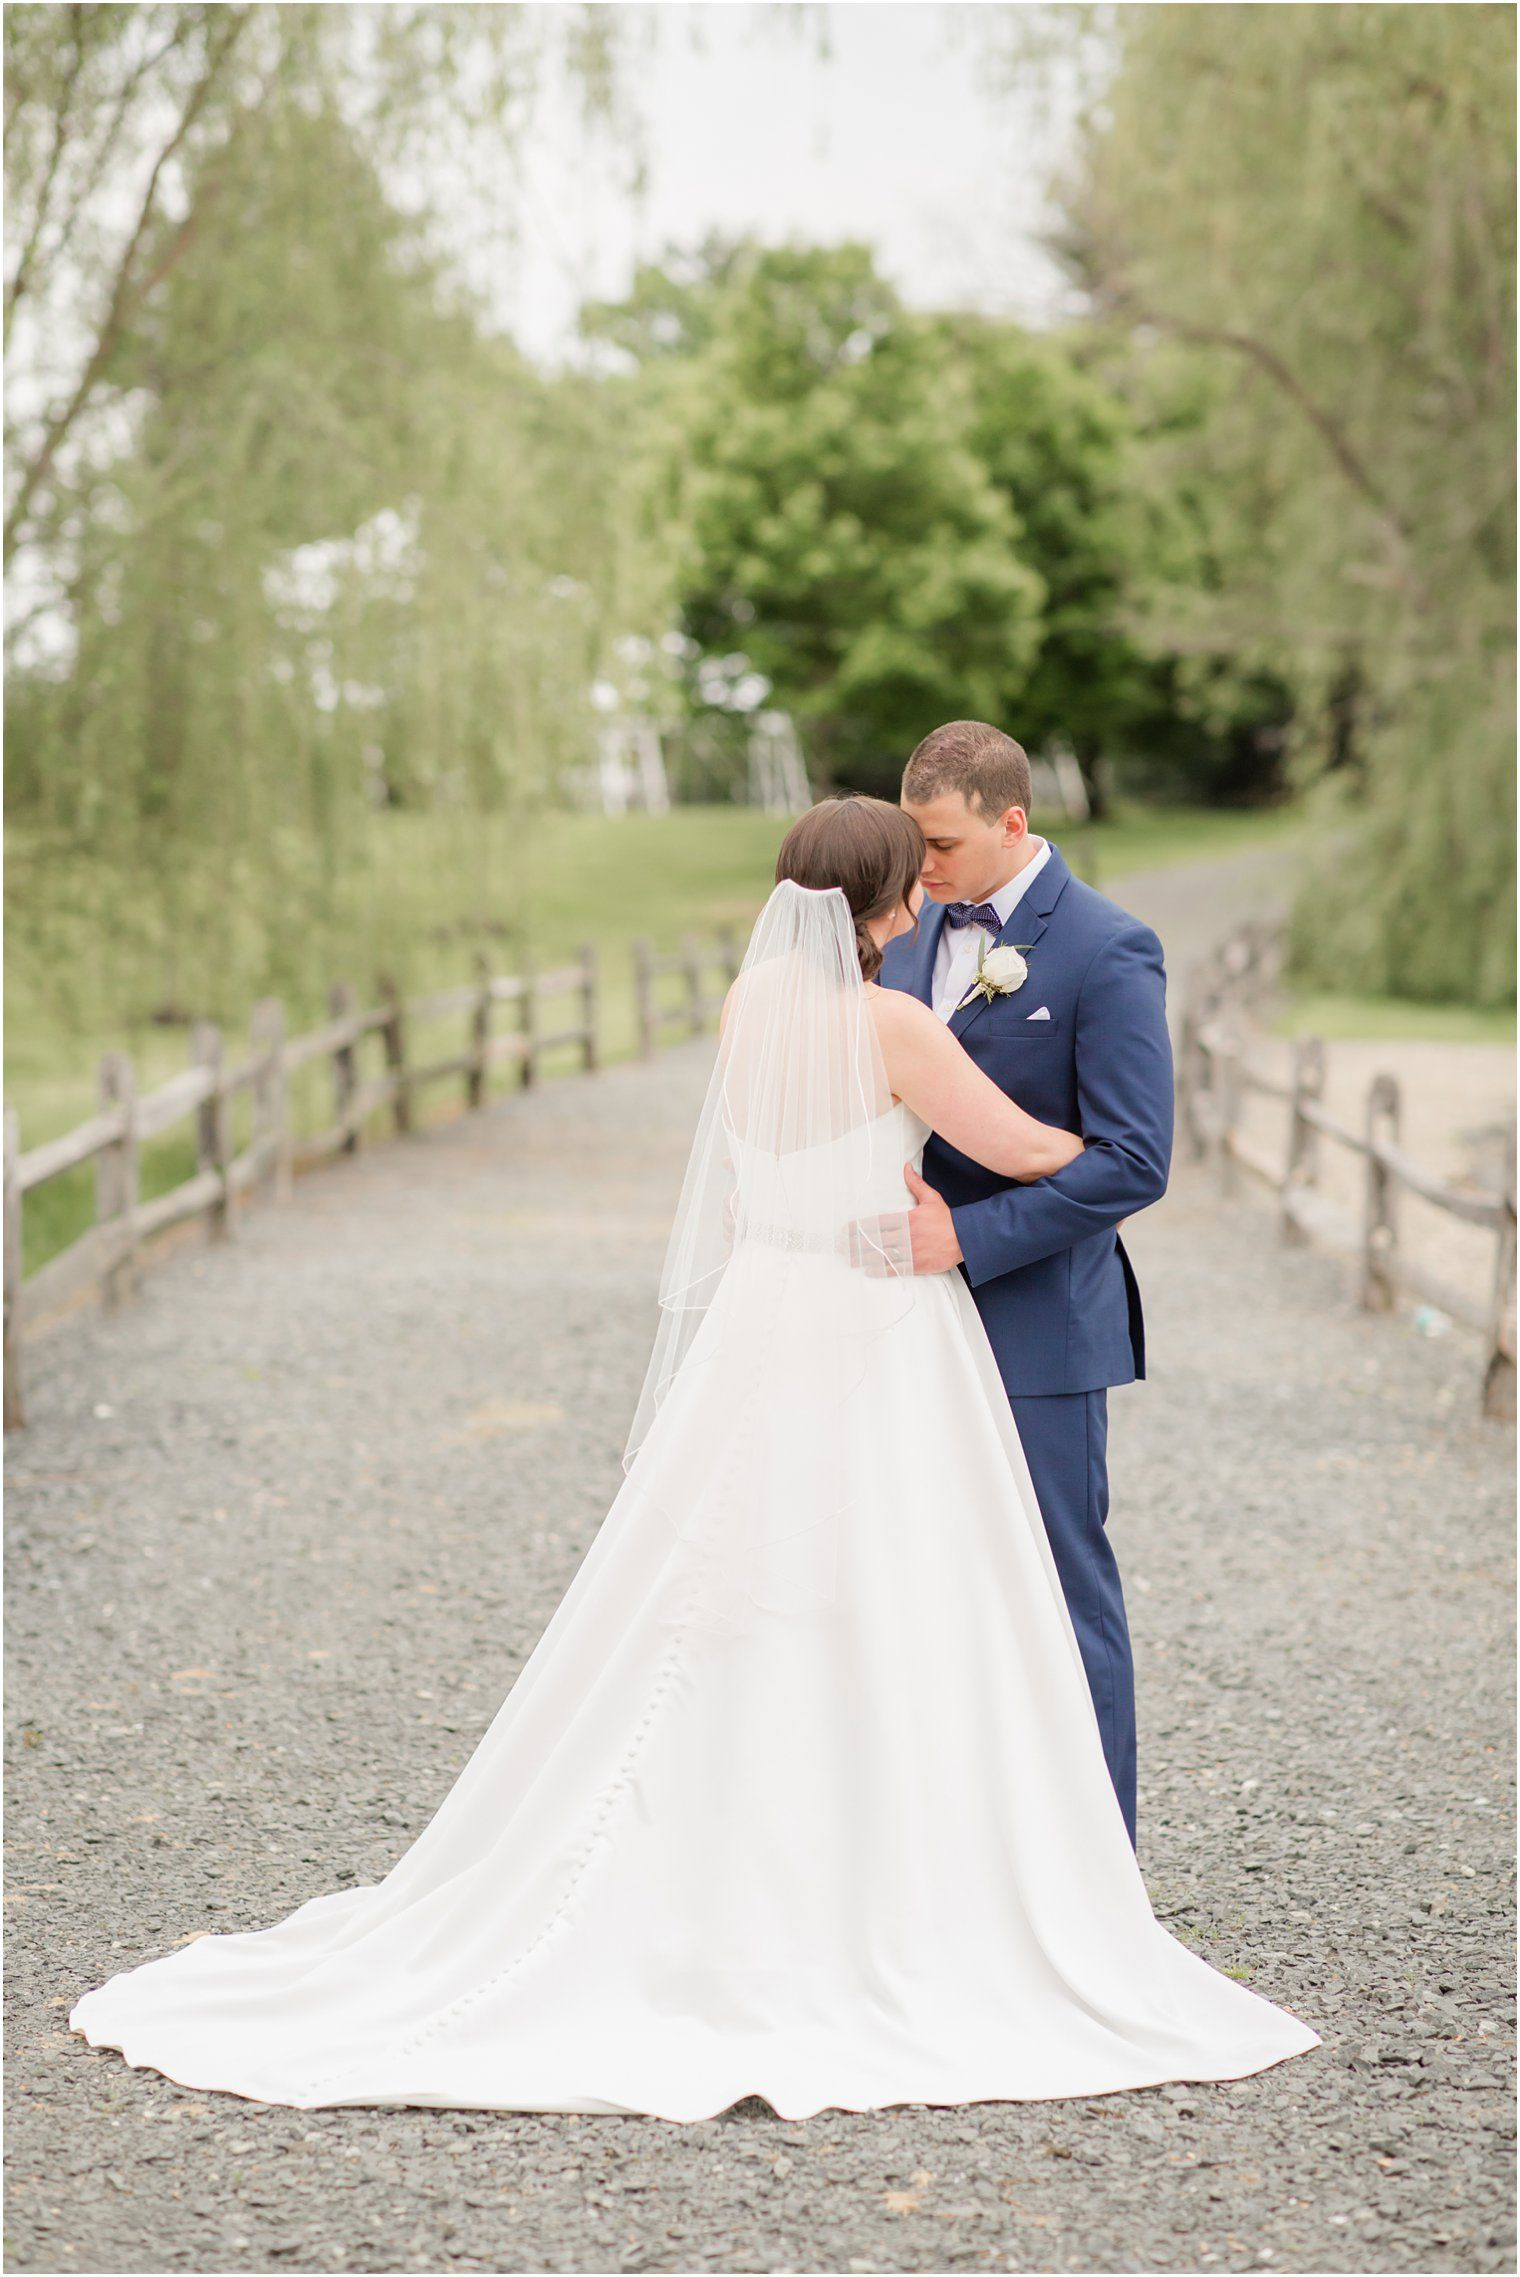 Windows on the Water at Frogbridge Wedding | Nj weddings ...